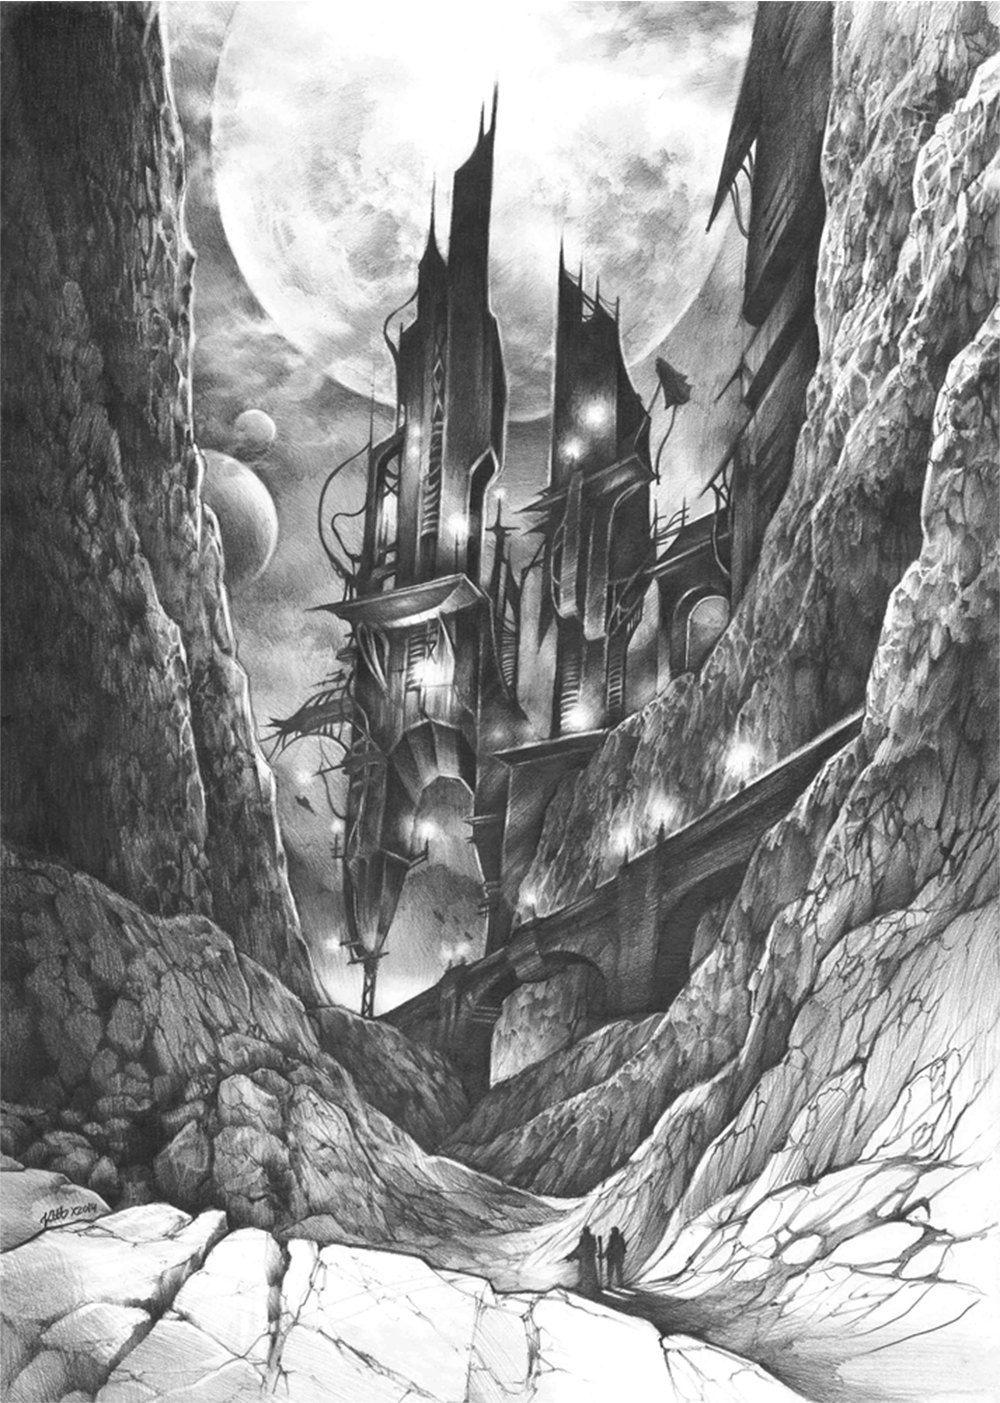 Original fantasy illustration by katarzyna kmiecik original pencil drawing futuristic art imaginary world future architecture realism